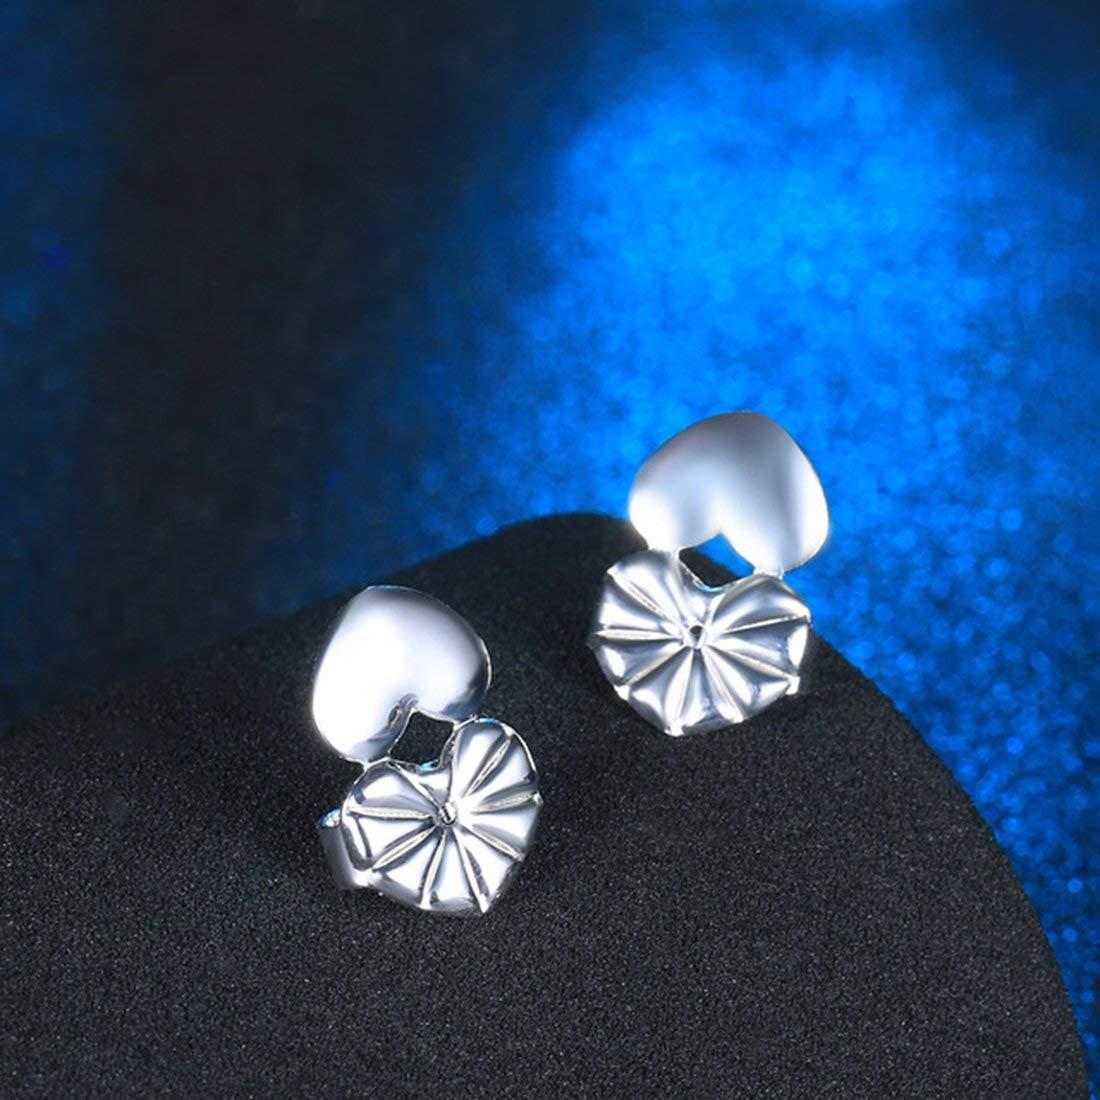 Formulaone Delicate Earring Backs Support Magic Earring Lifts Hipoalergé nico Push Earring Back Ear Clip Heart Shape Design